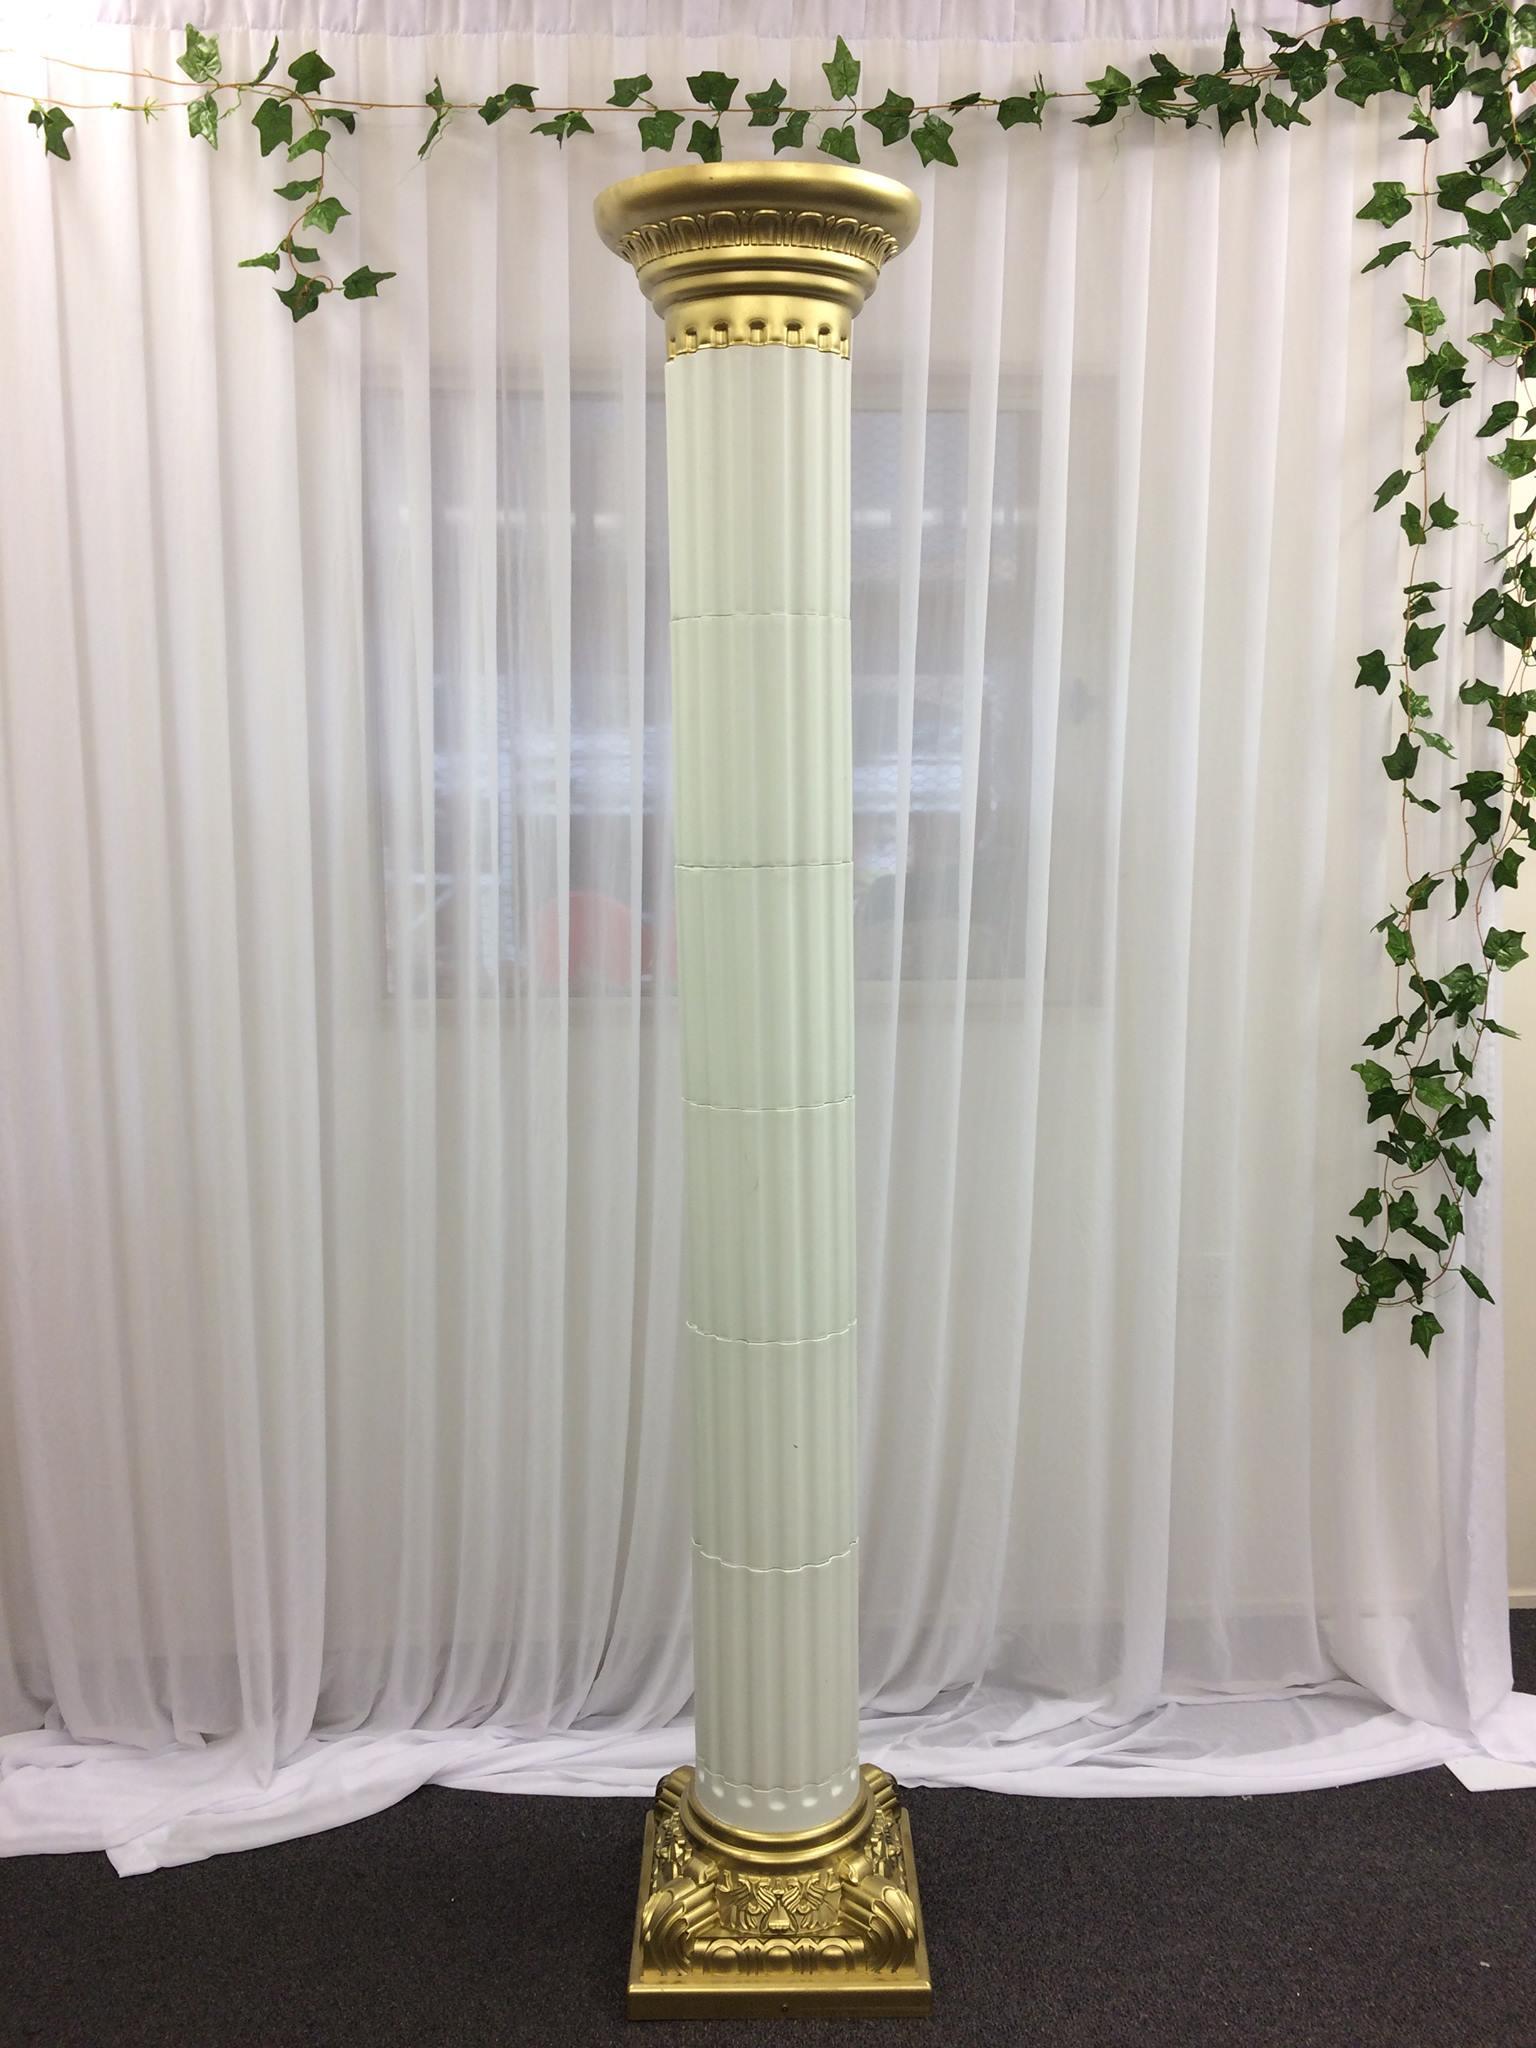 Gold and white roman column/